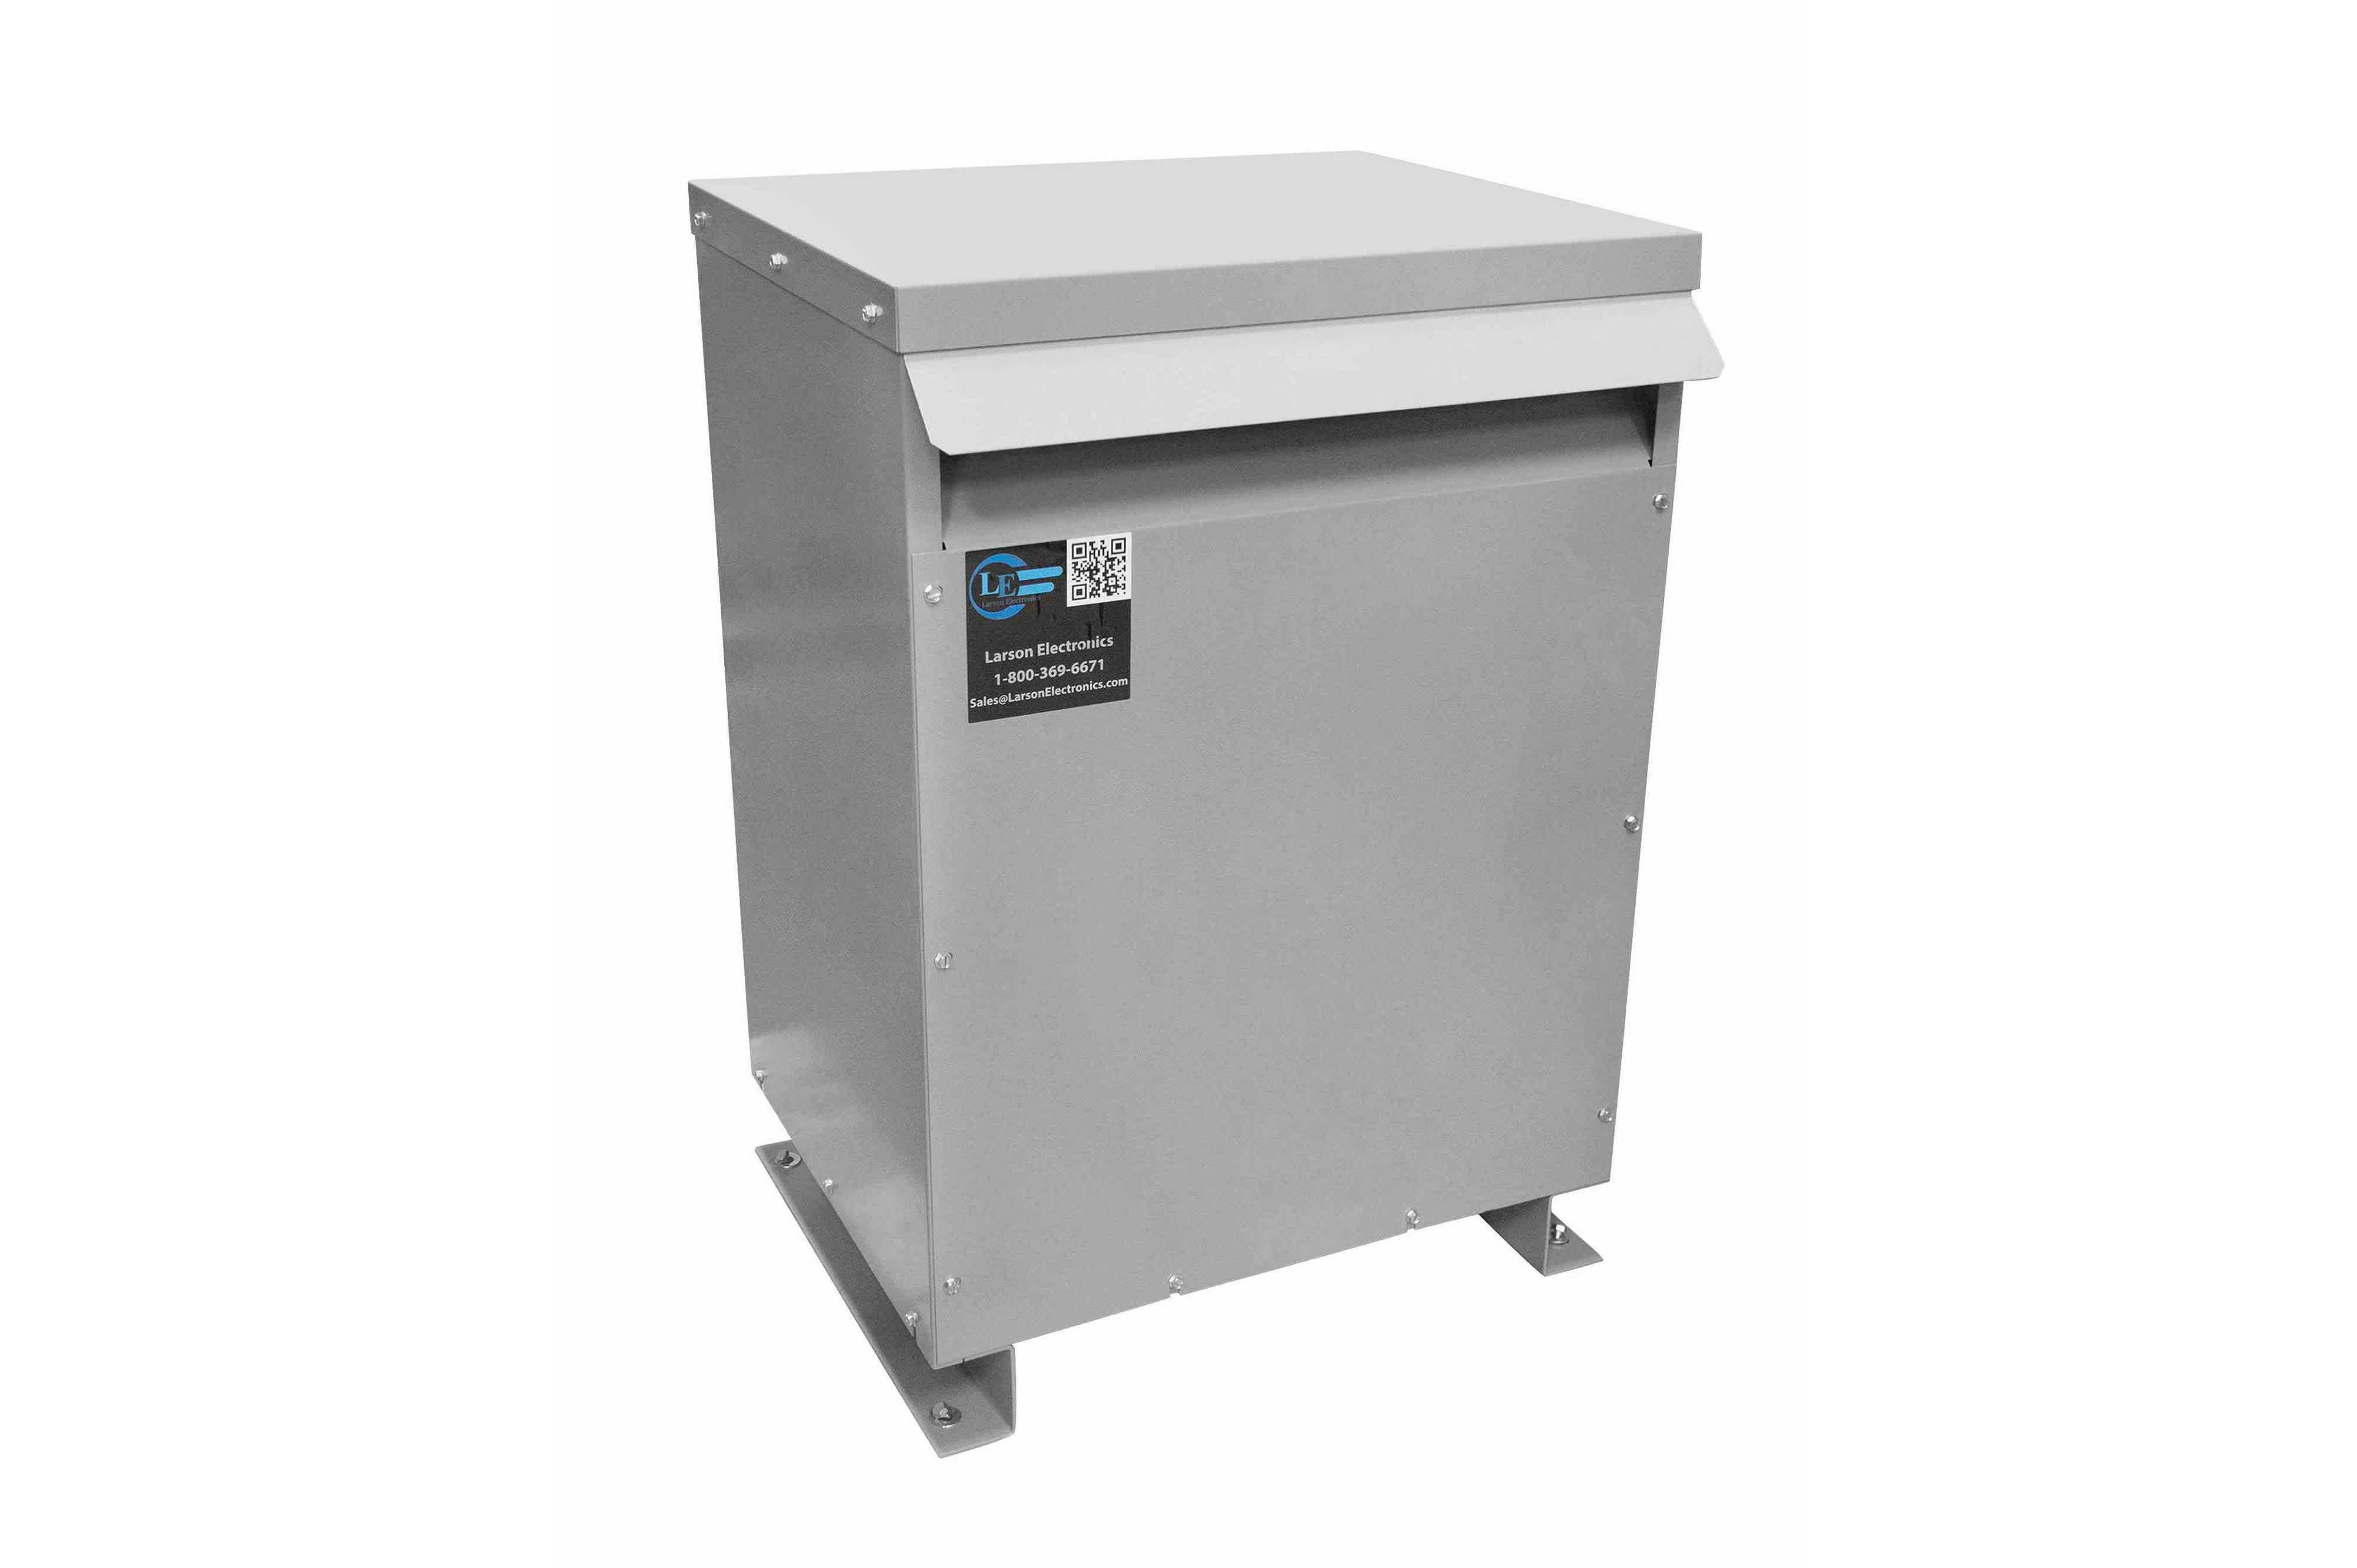 500 kVA 3PH Isolation Transformer, 575V Wye Primary, 208Y/120 Wye-N Secondary, N3R, Ventilated, 60 Hz